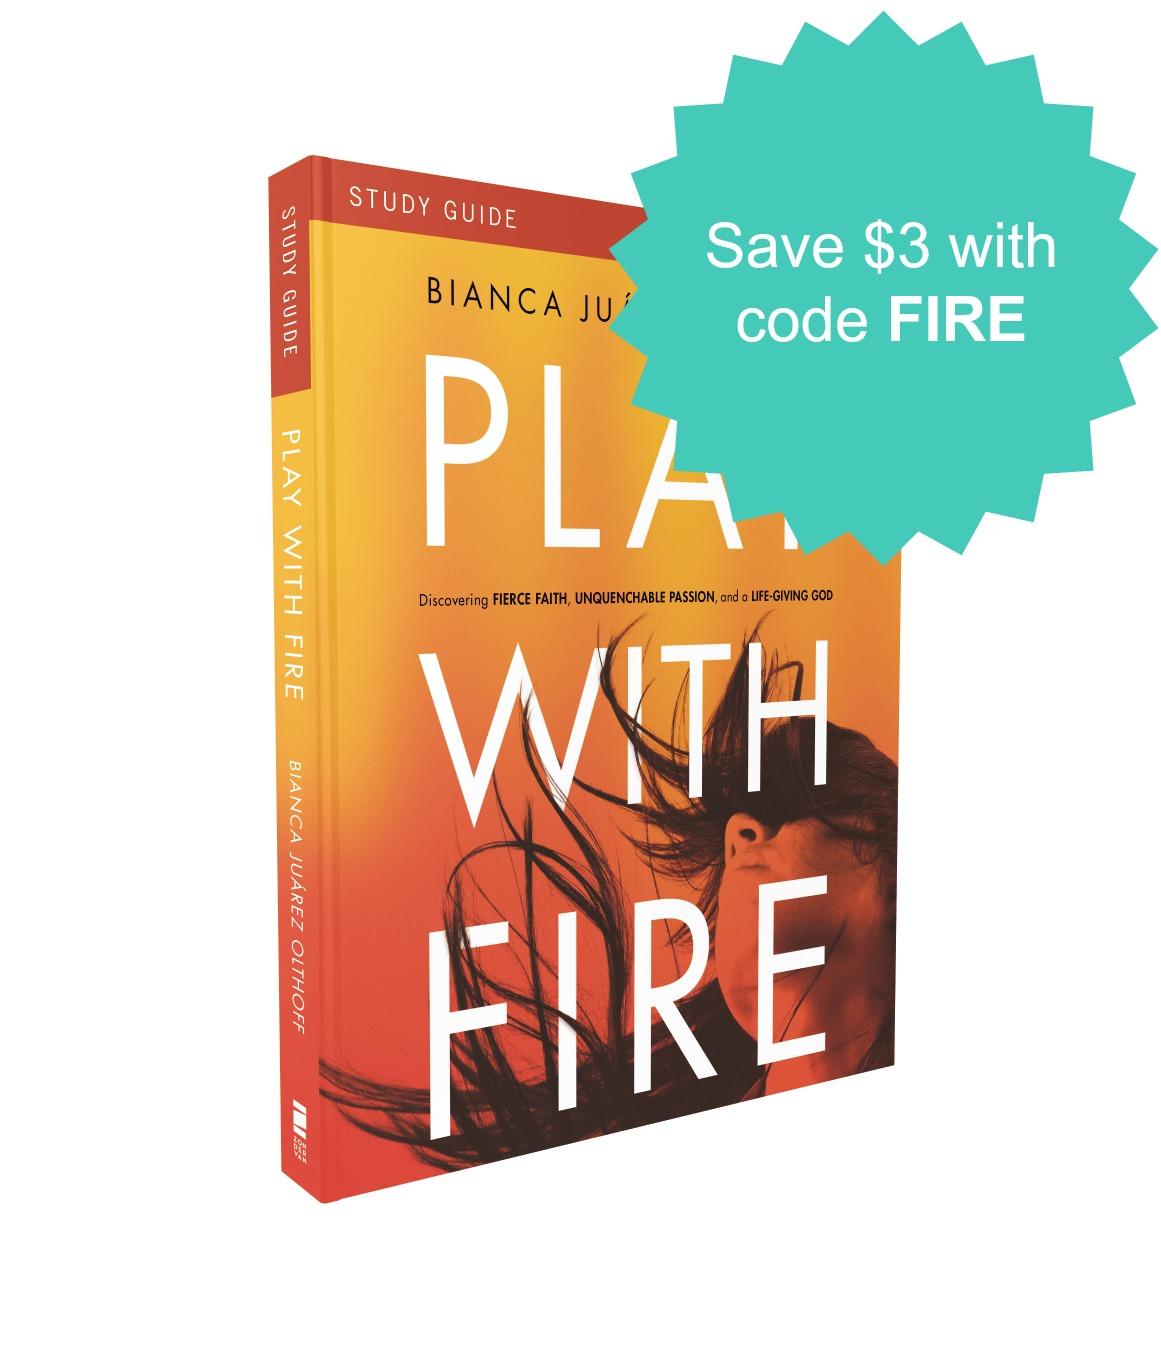 Workbooks spiritual gifts workbook : Play With Fire Online Bible Study - FaithGateway